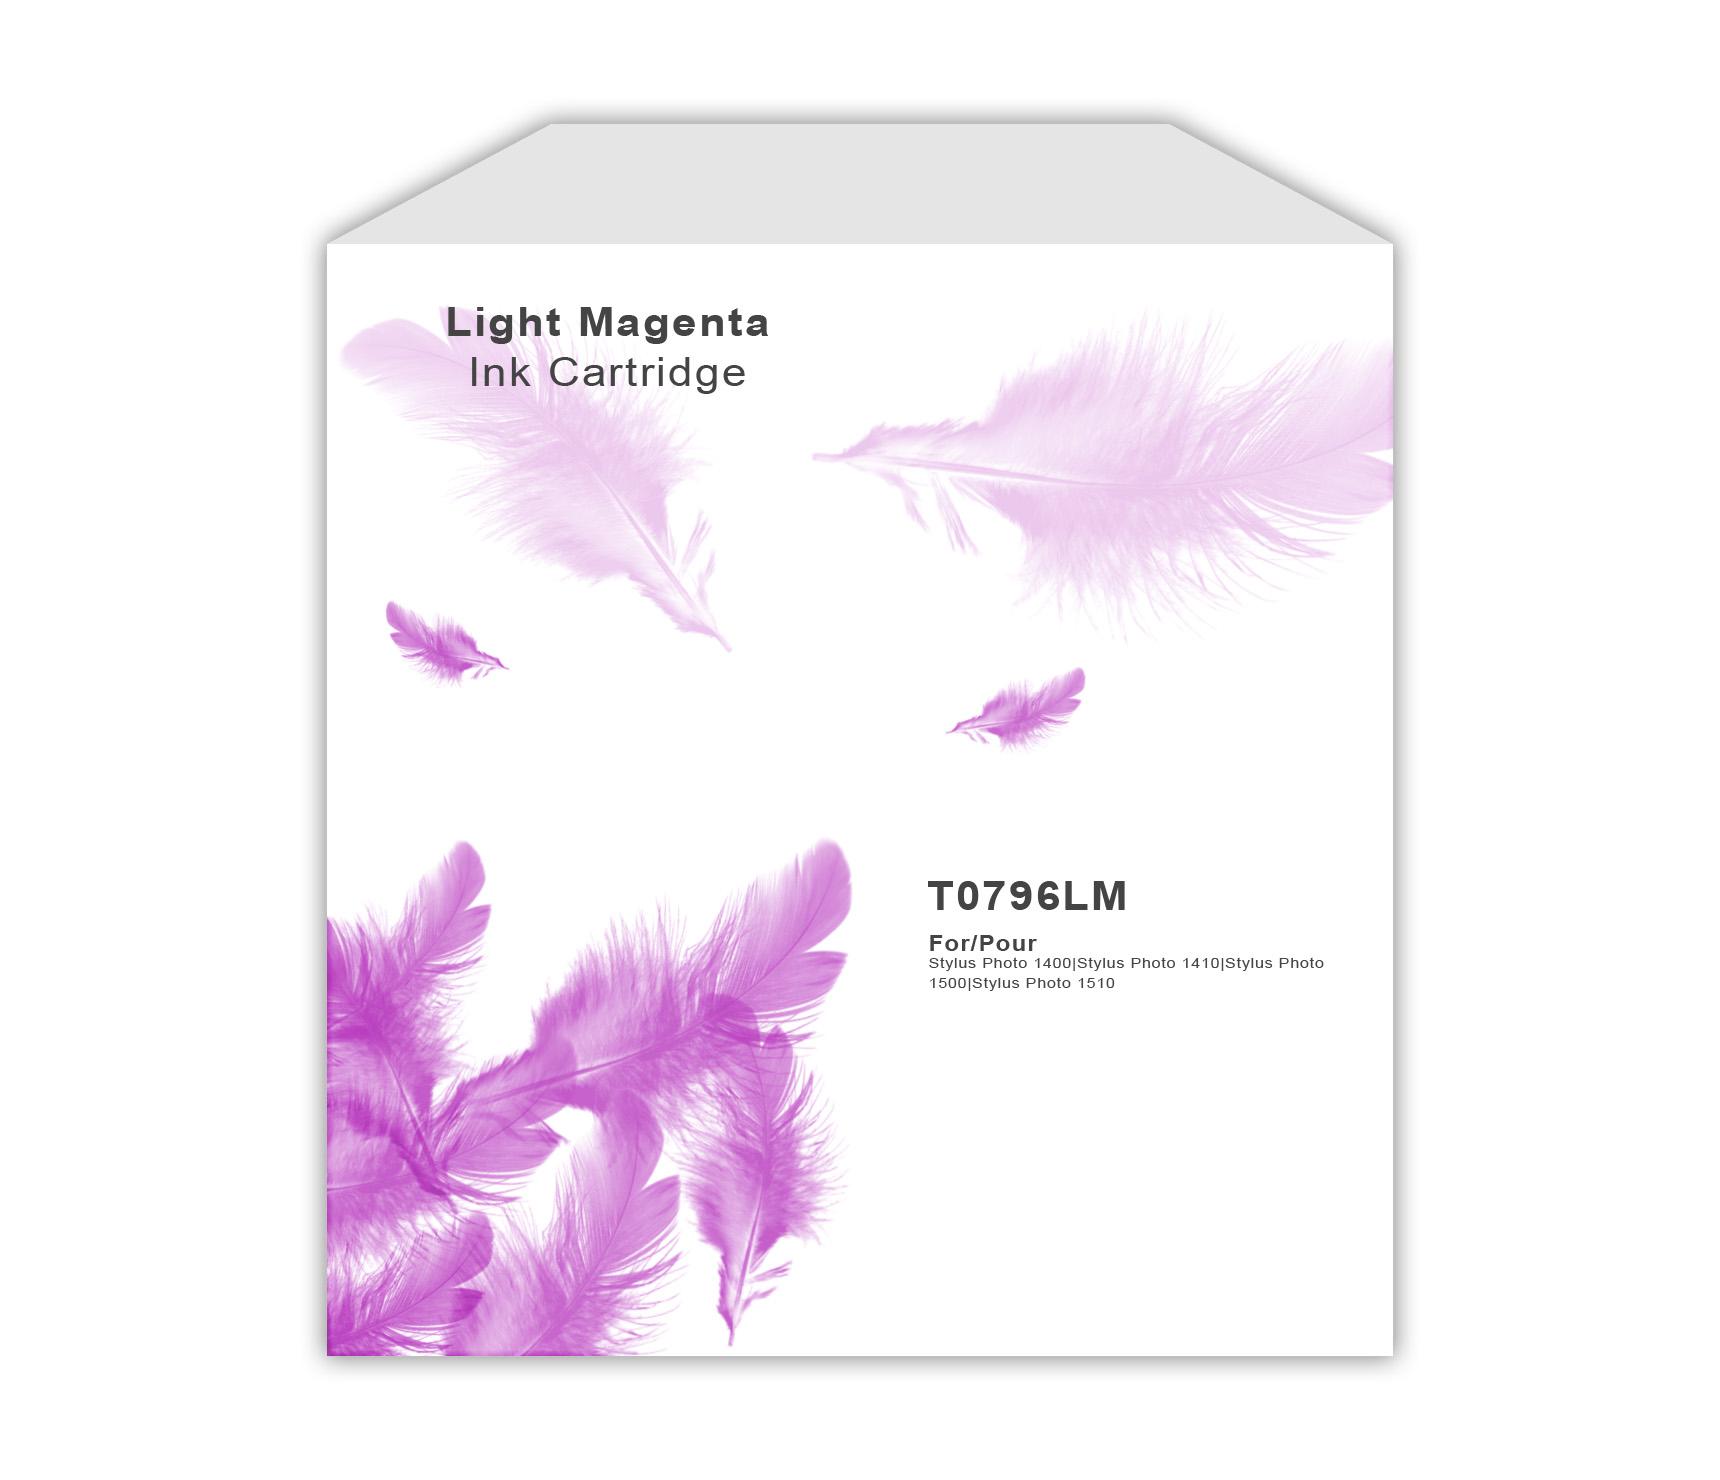 Epson TO796 Light Magenta Ink Cartridge